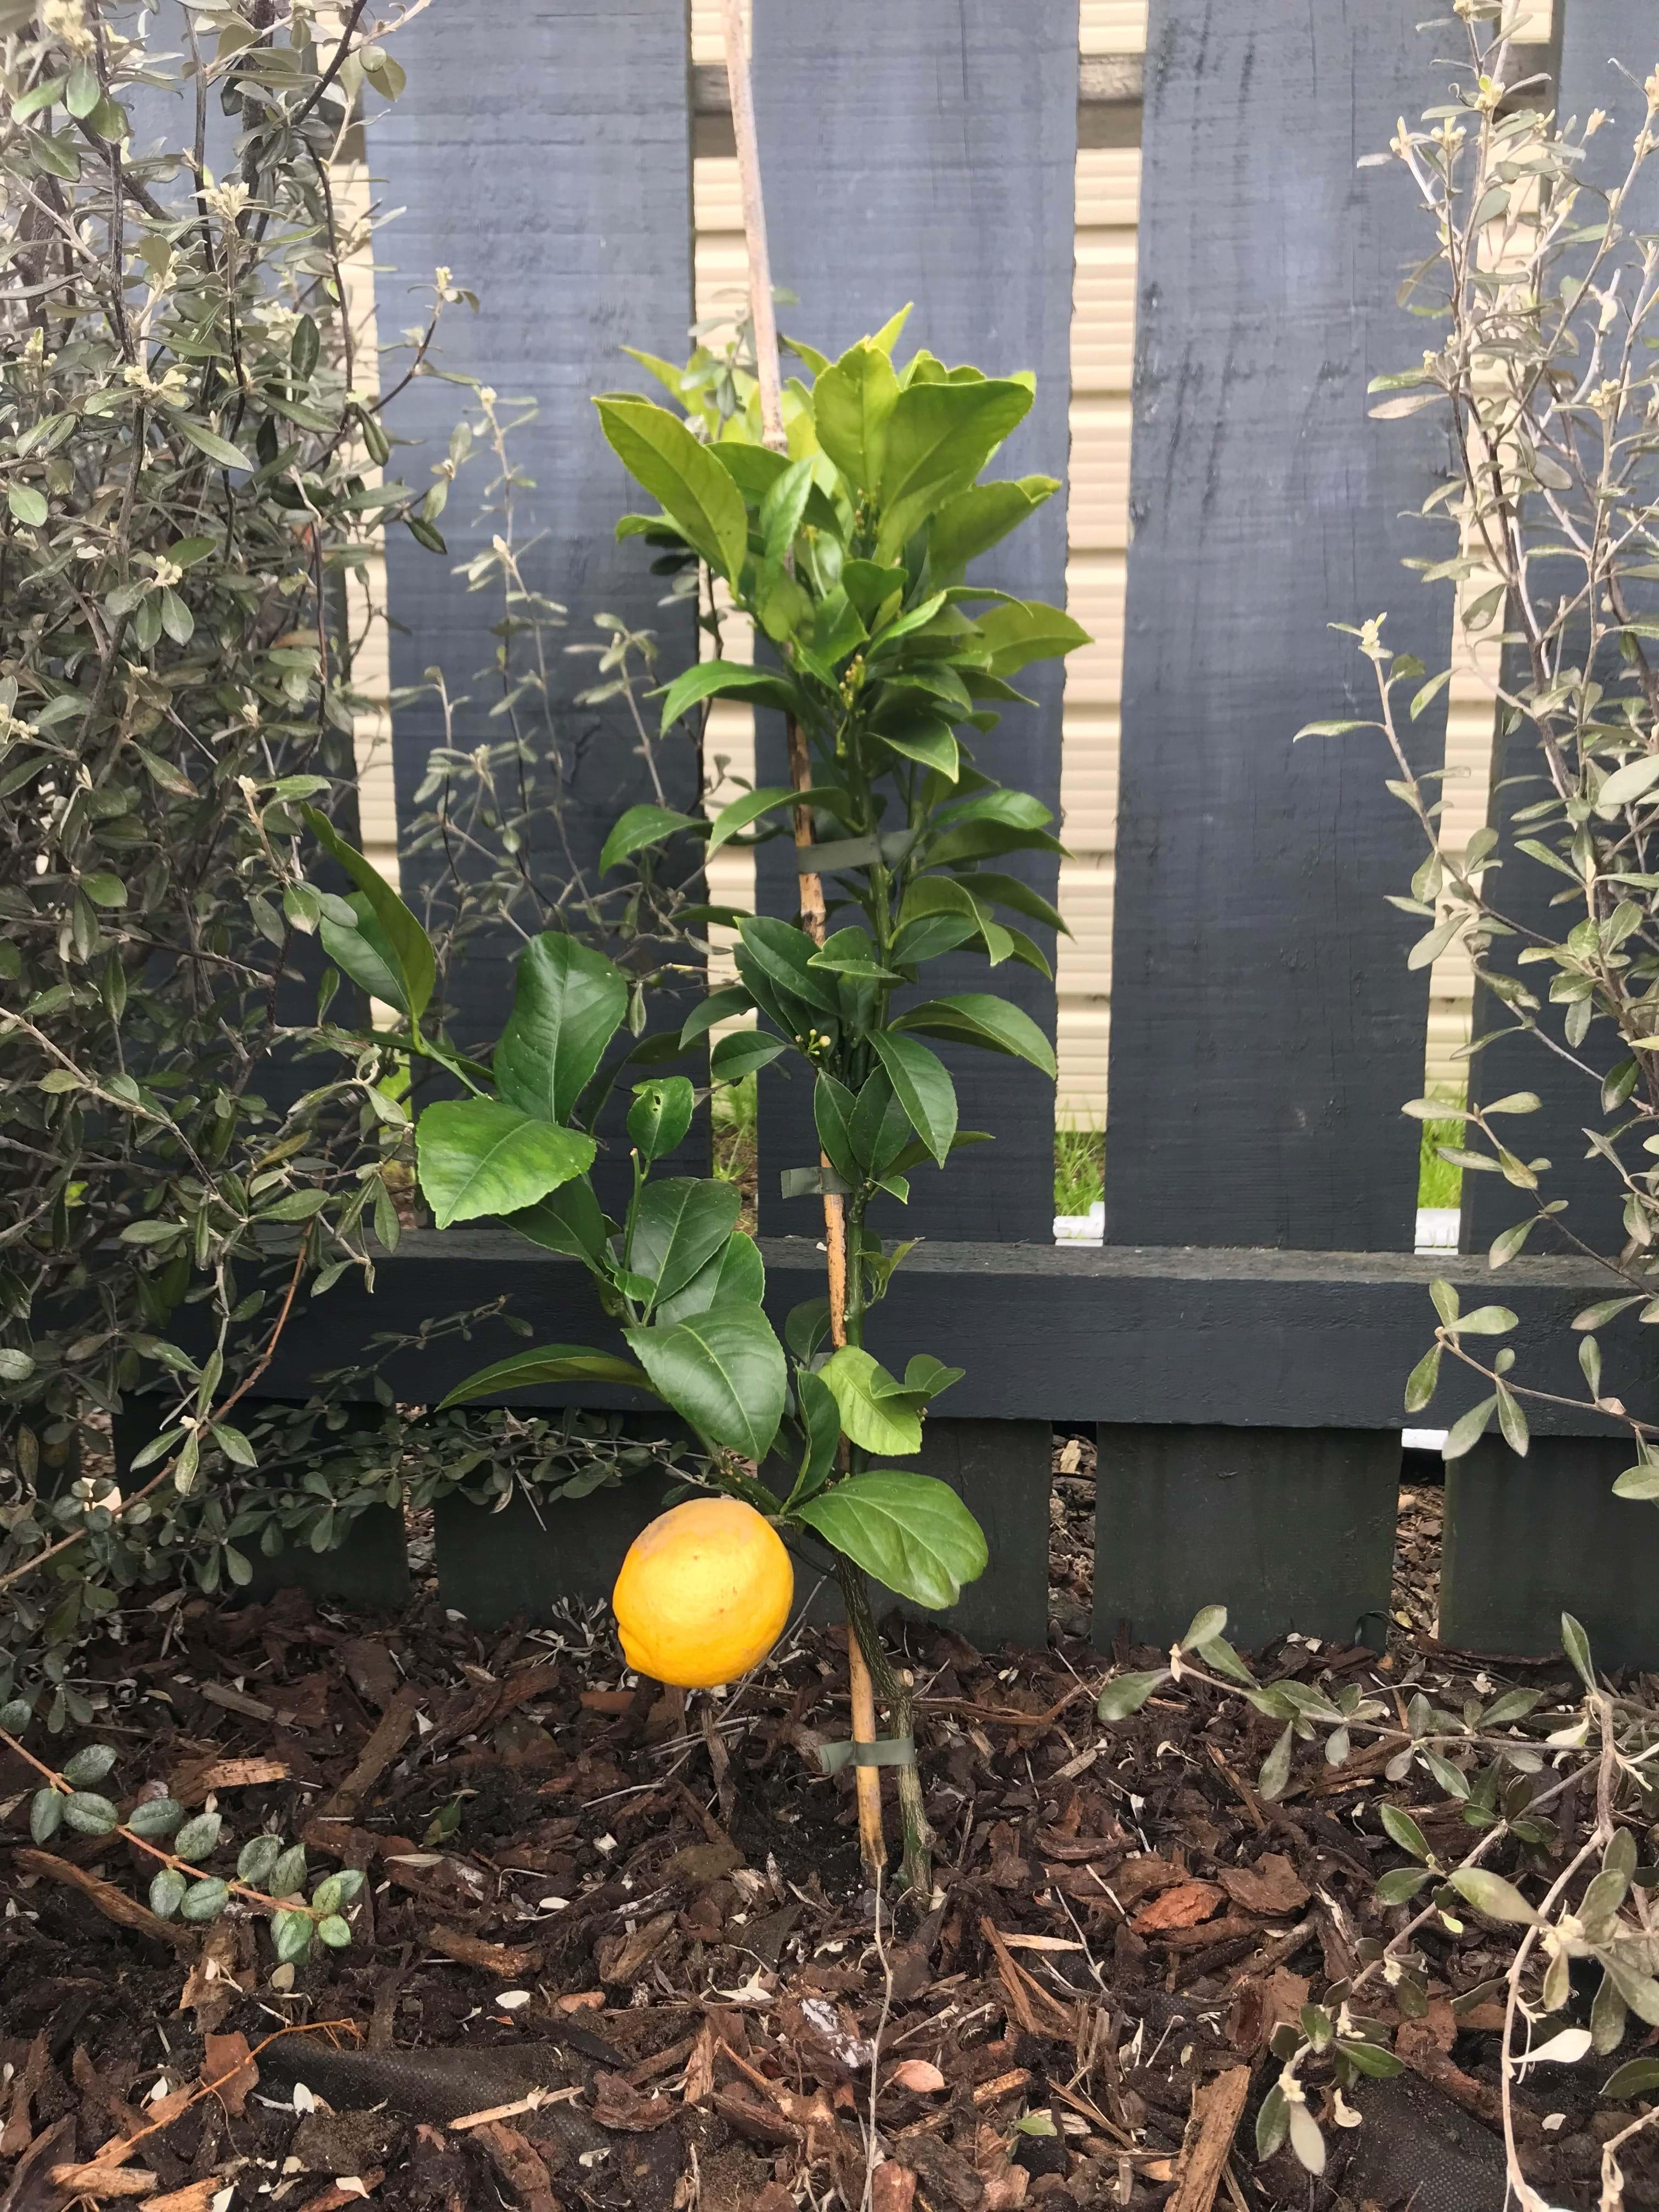 Planting a lemon tree